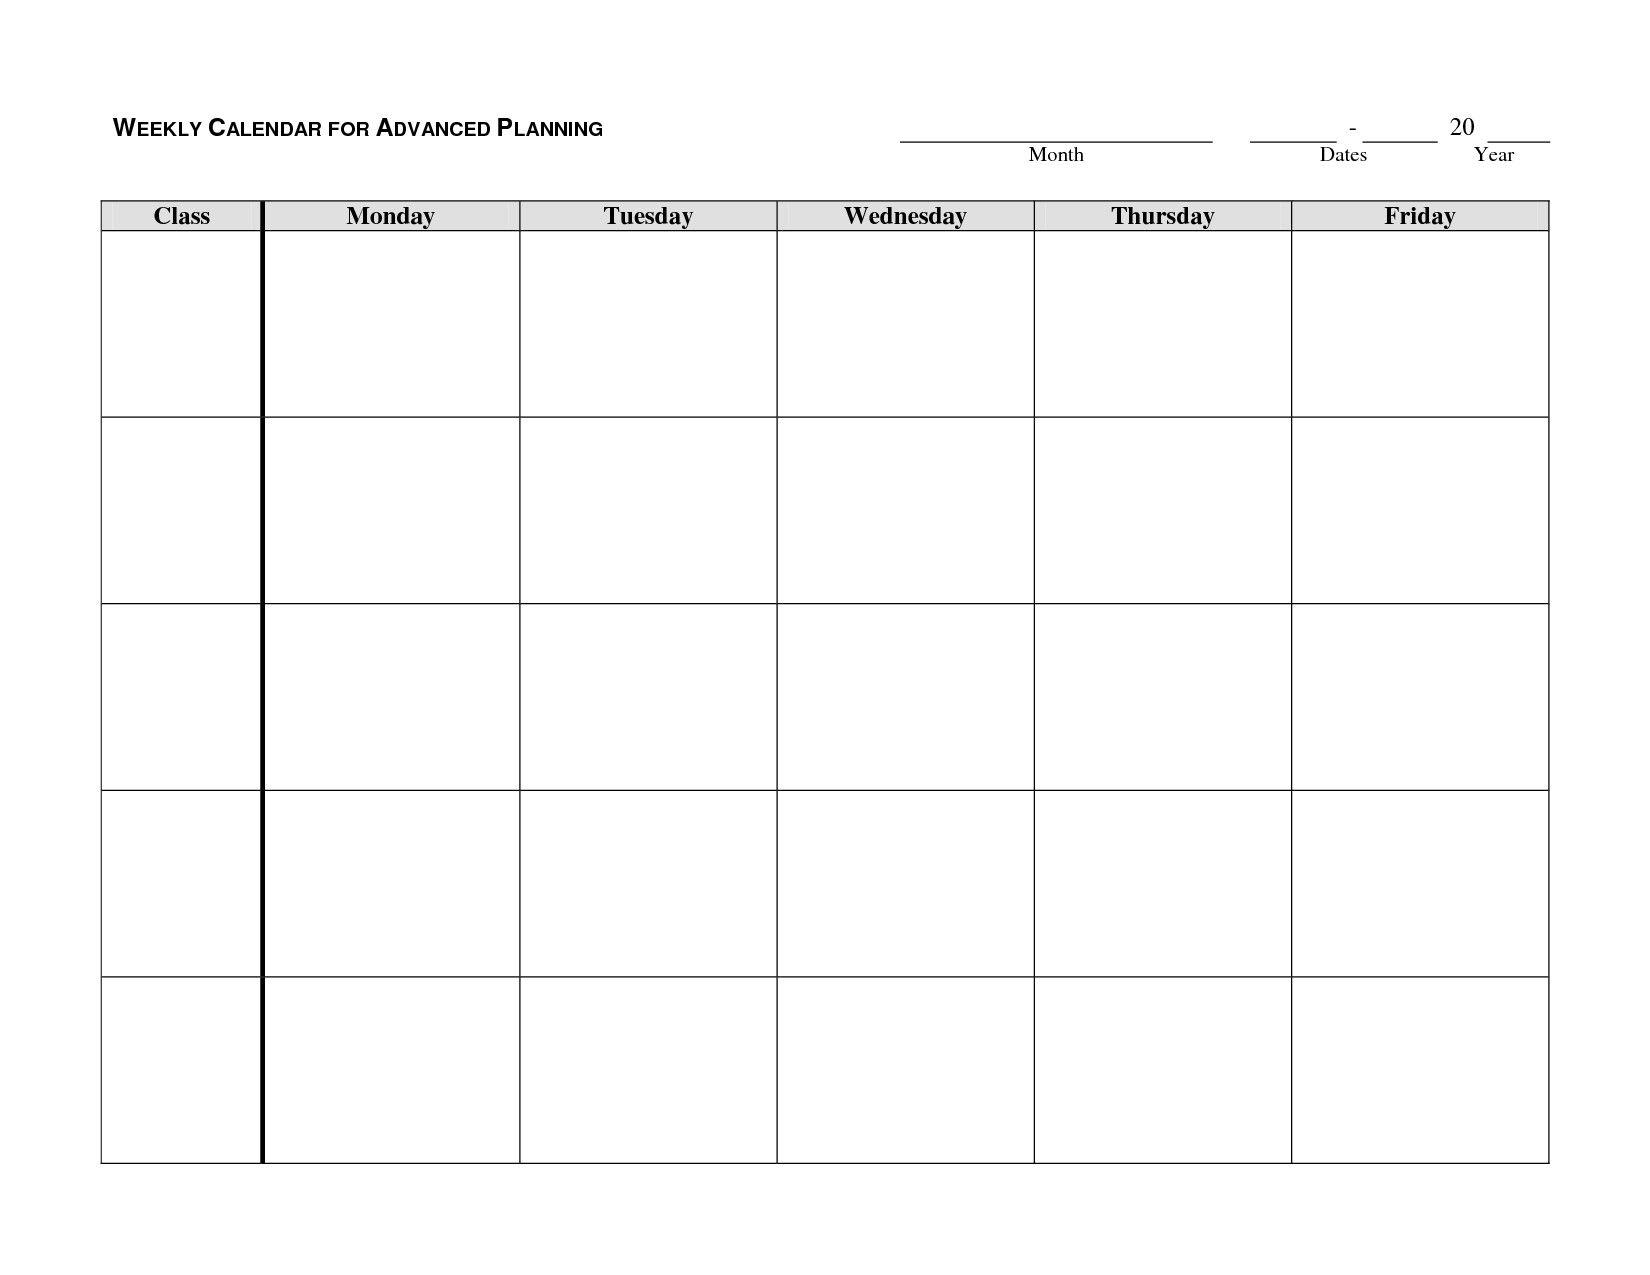 Printable Calendar Monday Through Friday - Yolar.cinetonic